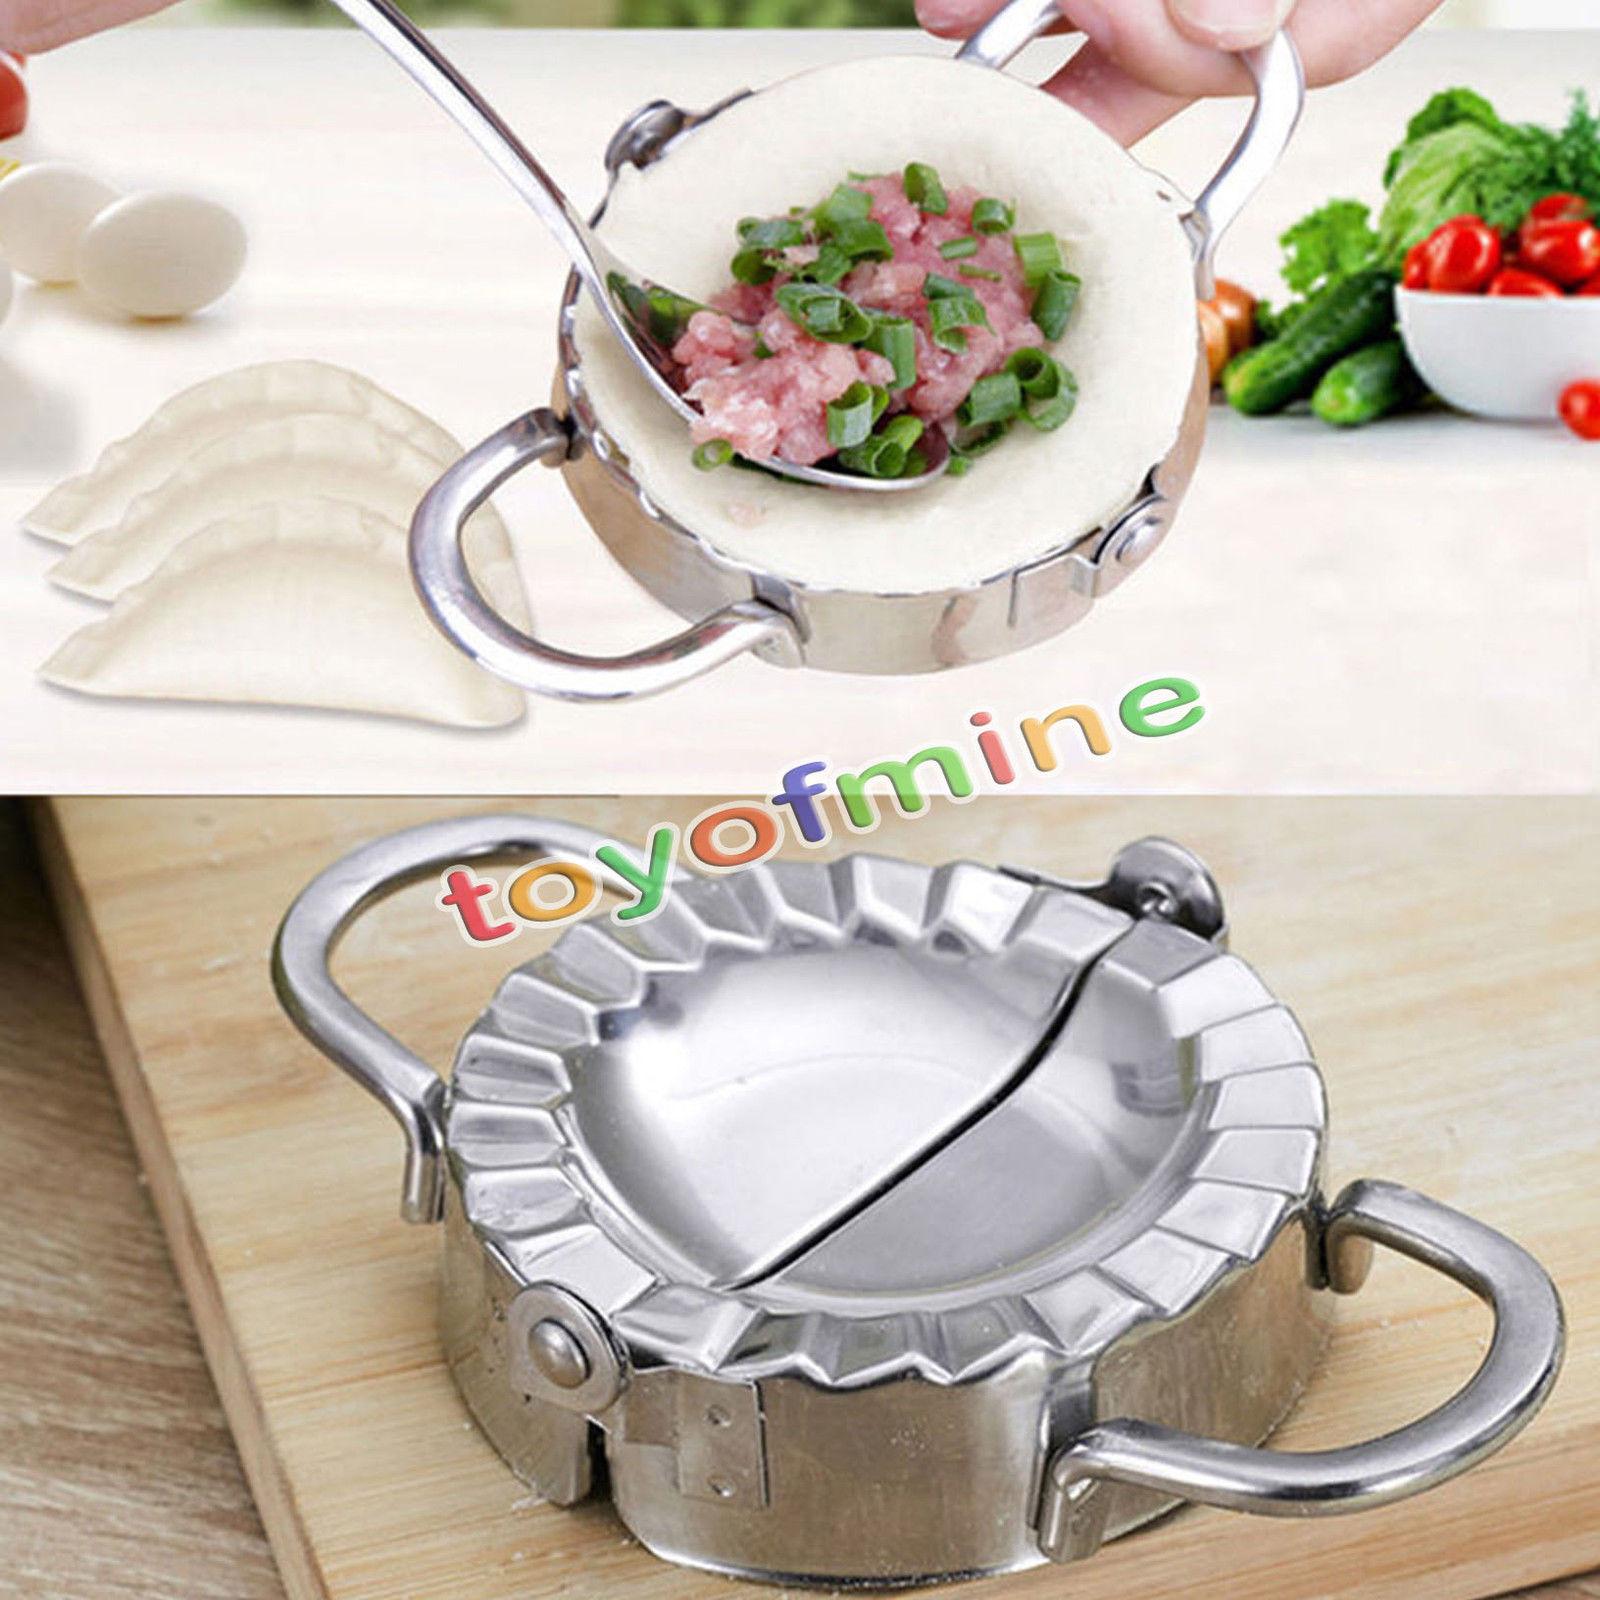 New eco friendly pastry tools stainless steel dumpling maker wraper dough cutter pie ravioli dumpling mould kitchen accessories